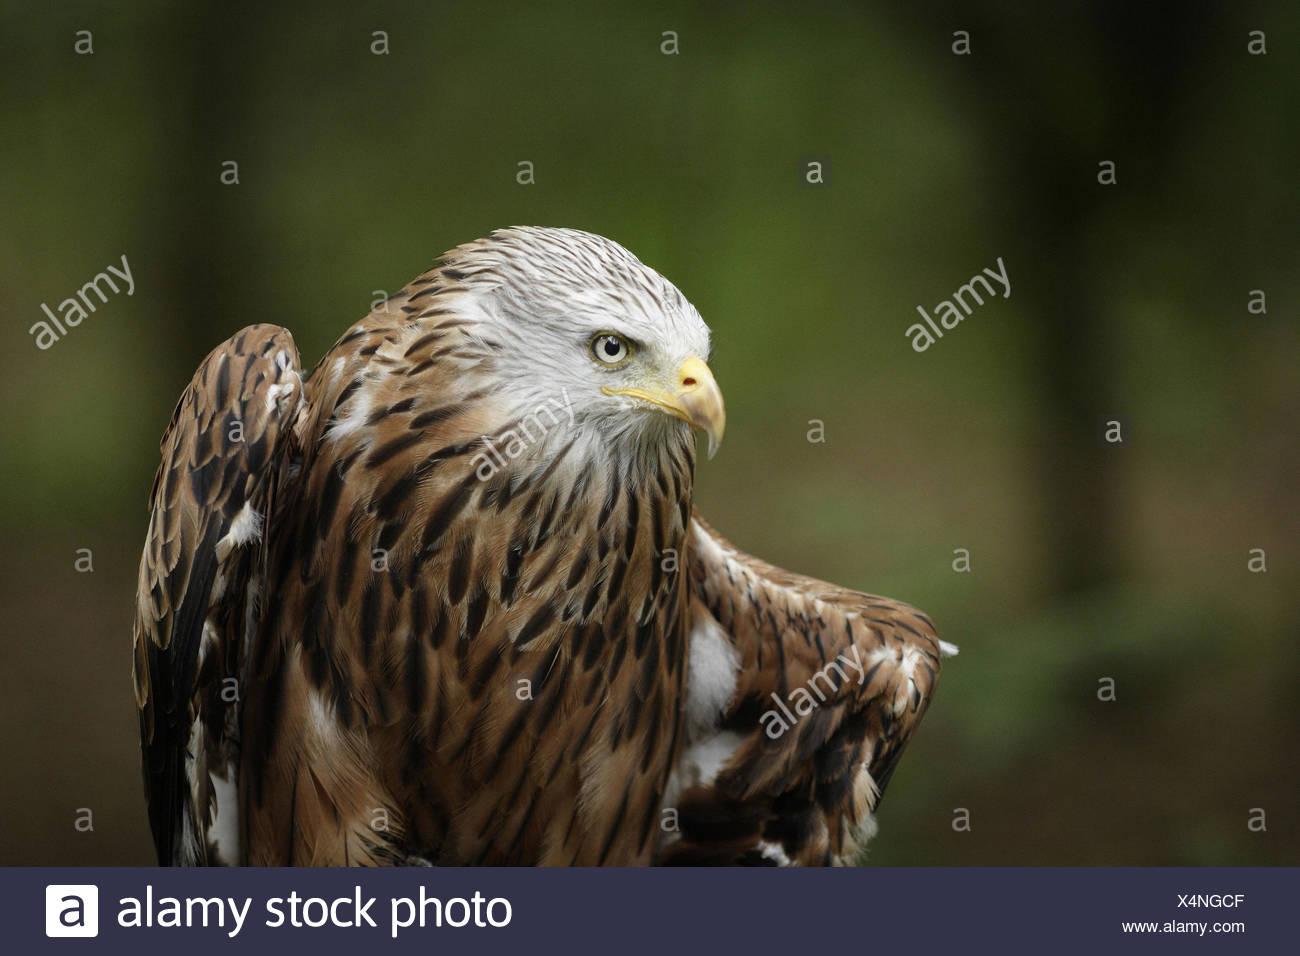 Milvus, portrait, bird of prey, red kite, head, kite, wildlife, Vertebrata, Wildlife - Stock Image